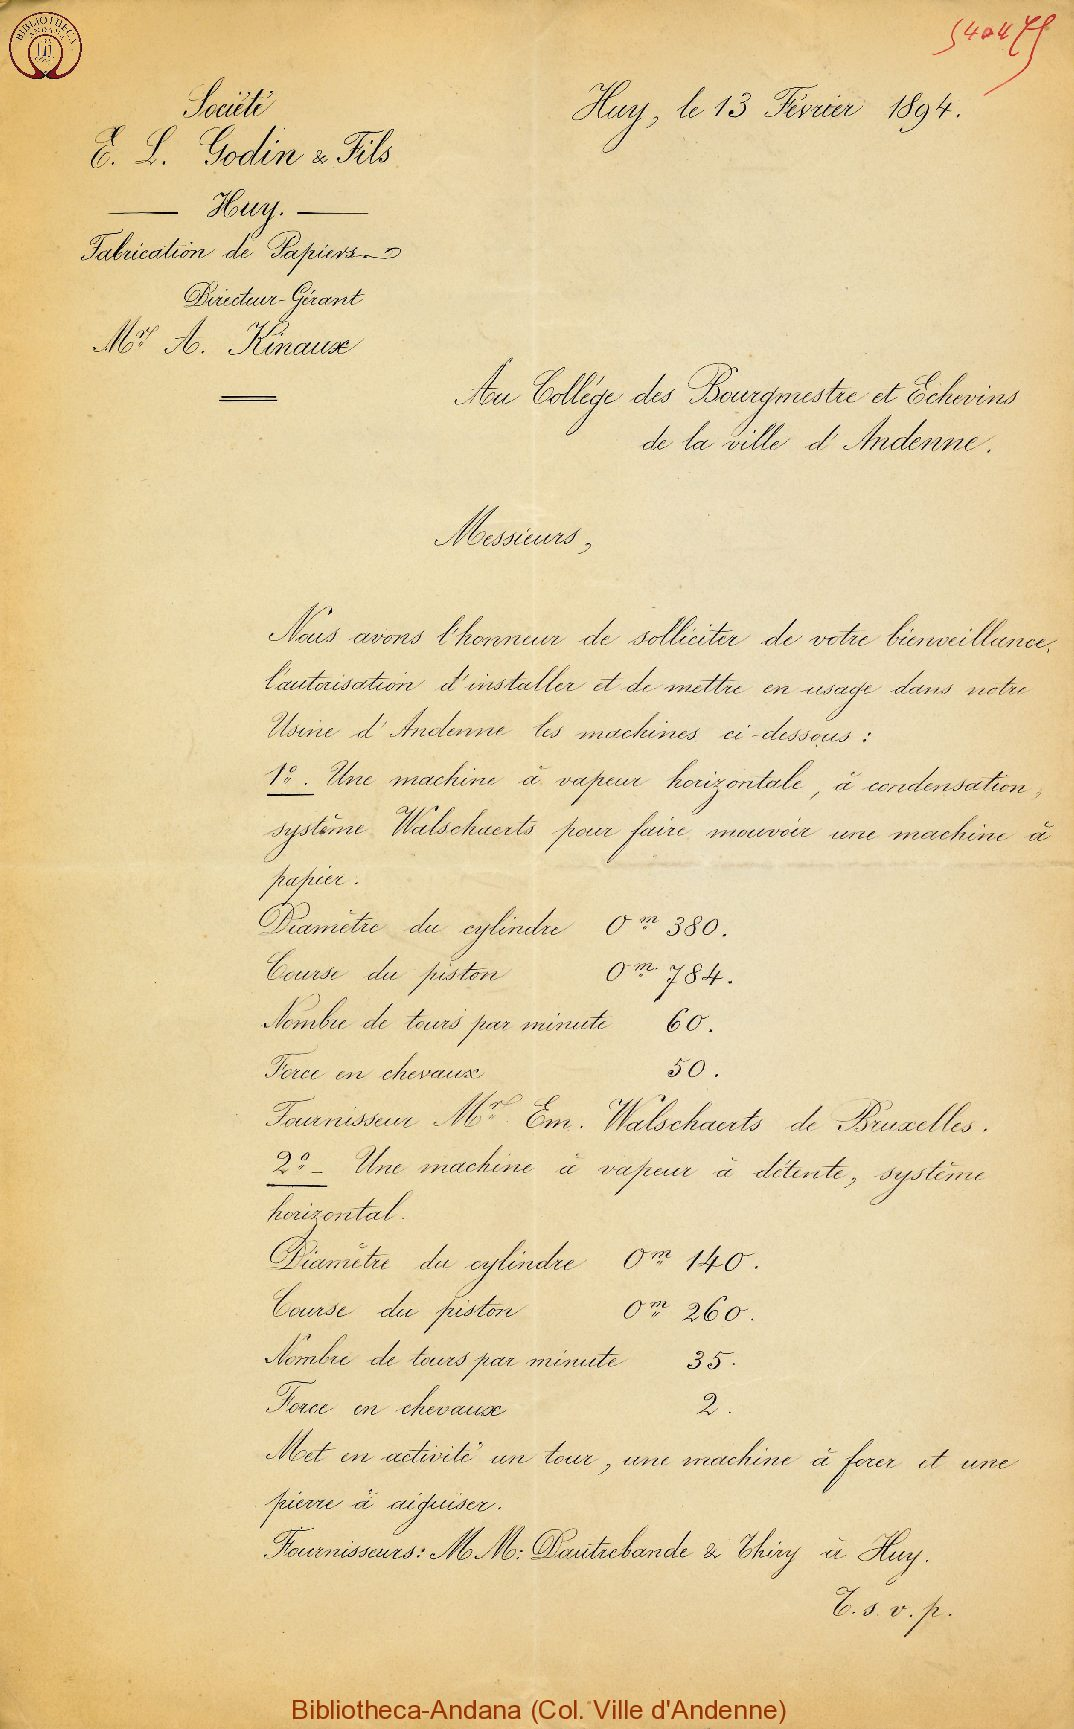 1894-02-13